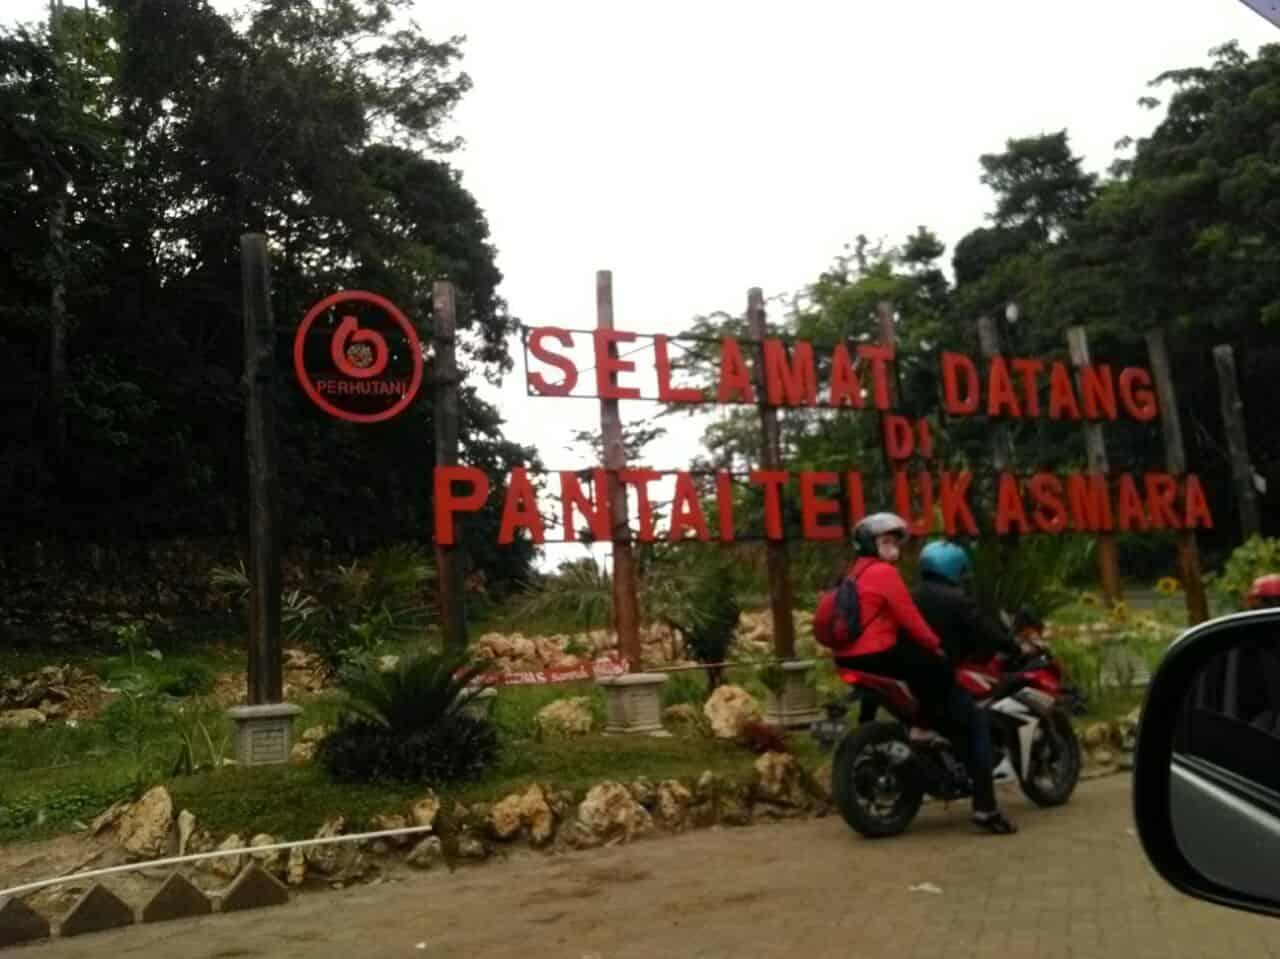 Berwisata ke Pantai Teluk Asmara Malang